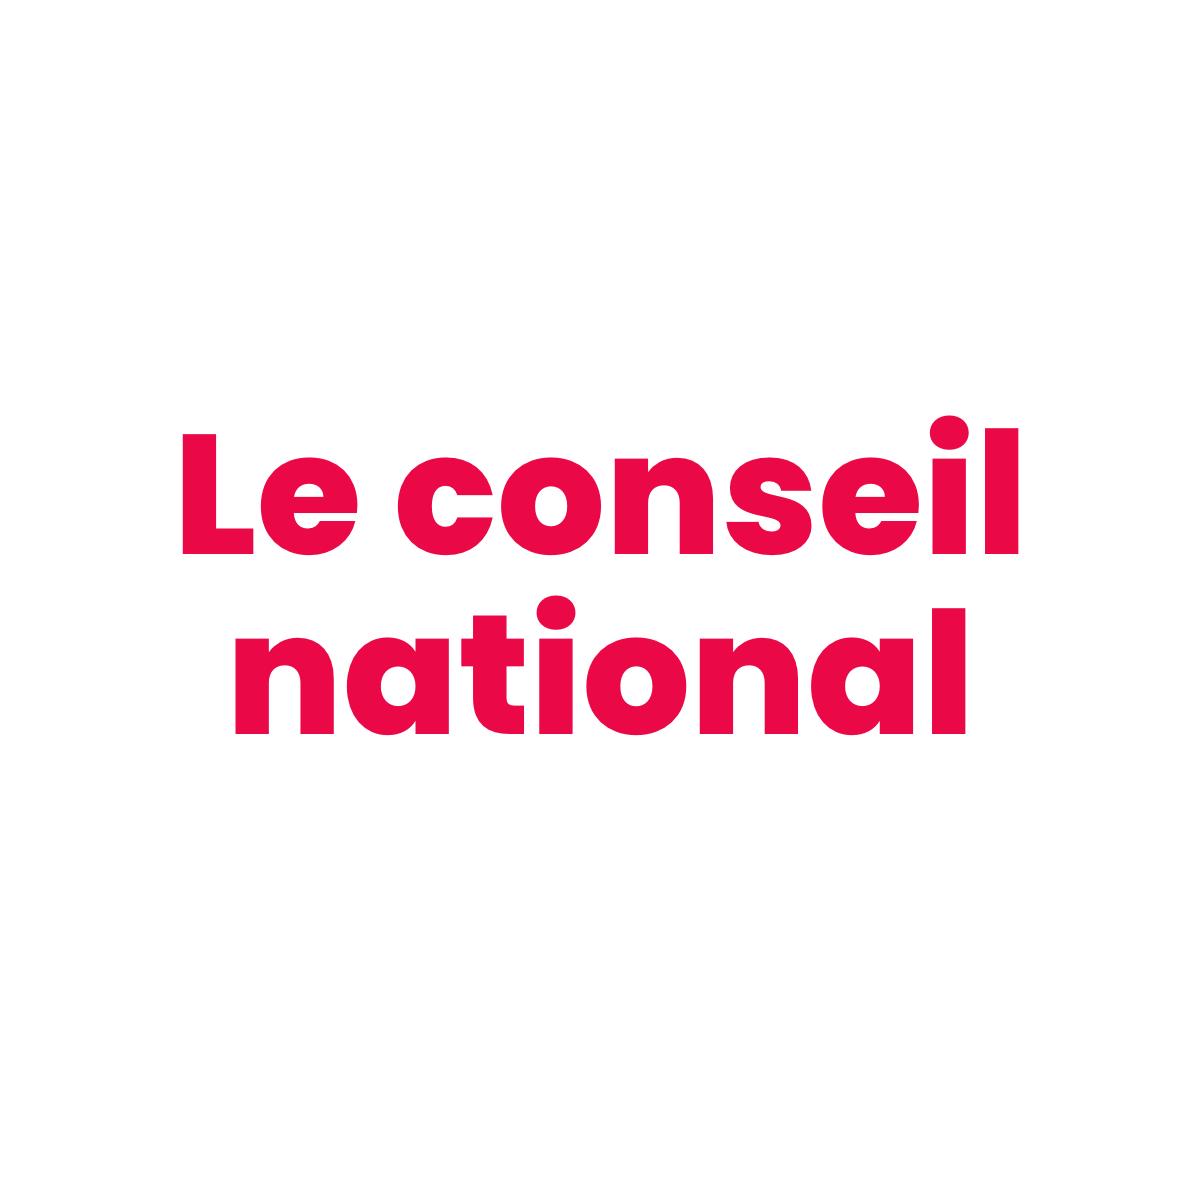 Le conseil national